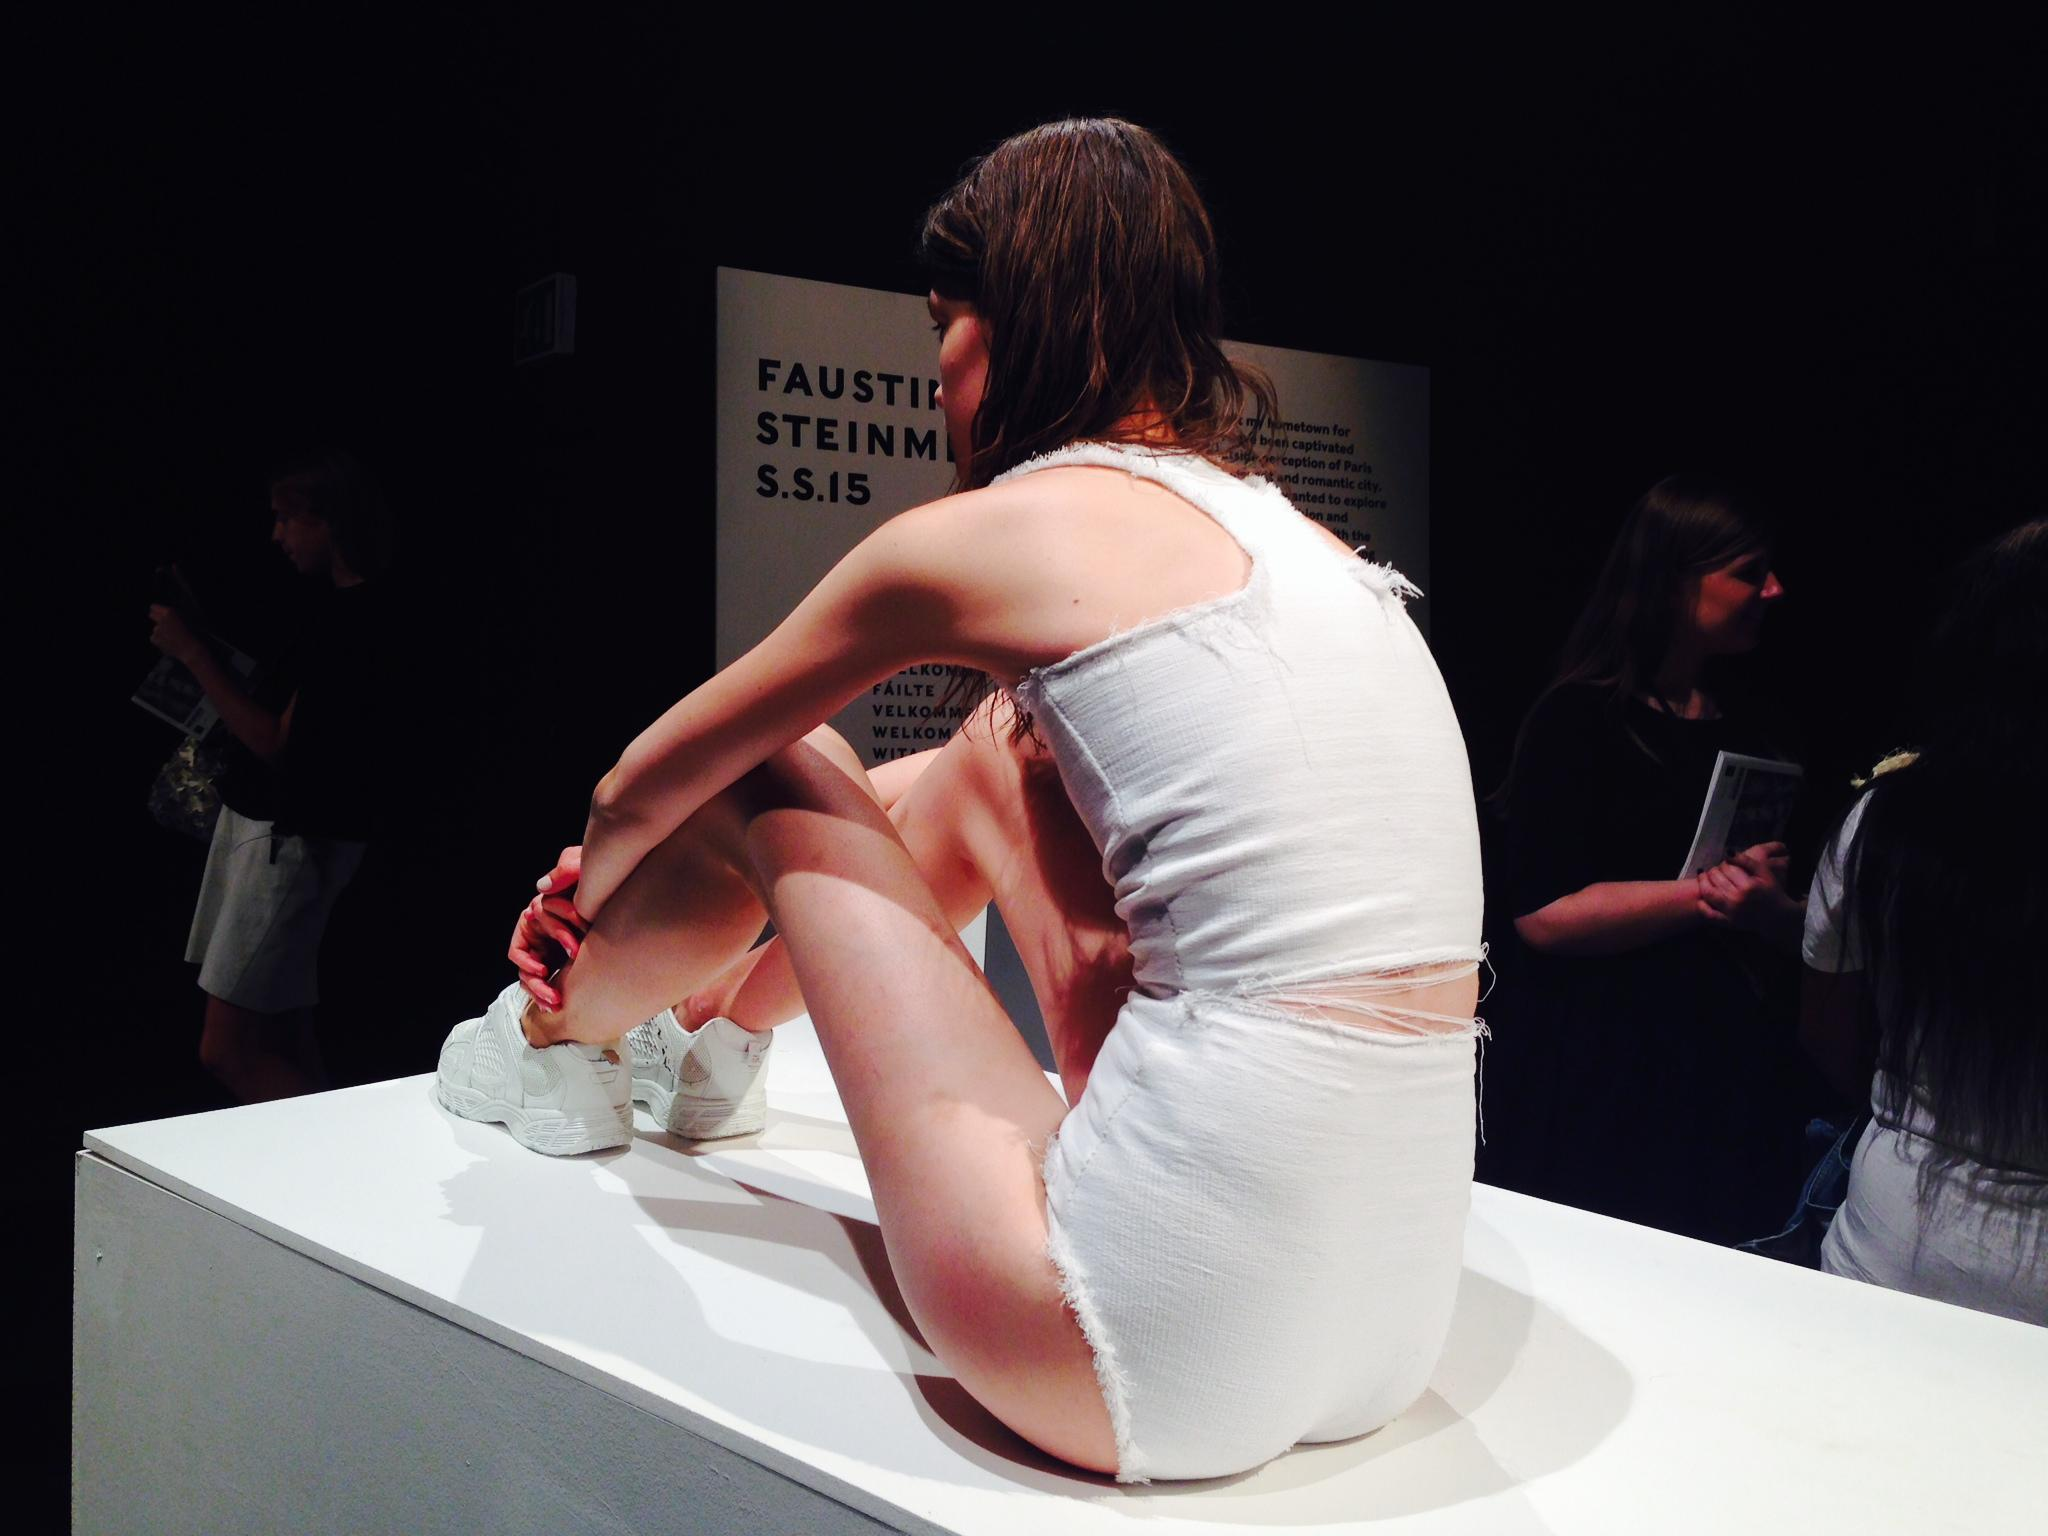 collection-faustine-steinmetz-londres-fashion-week-2014